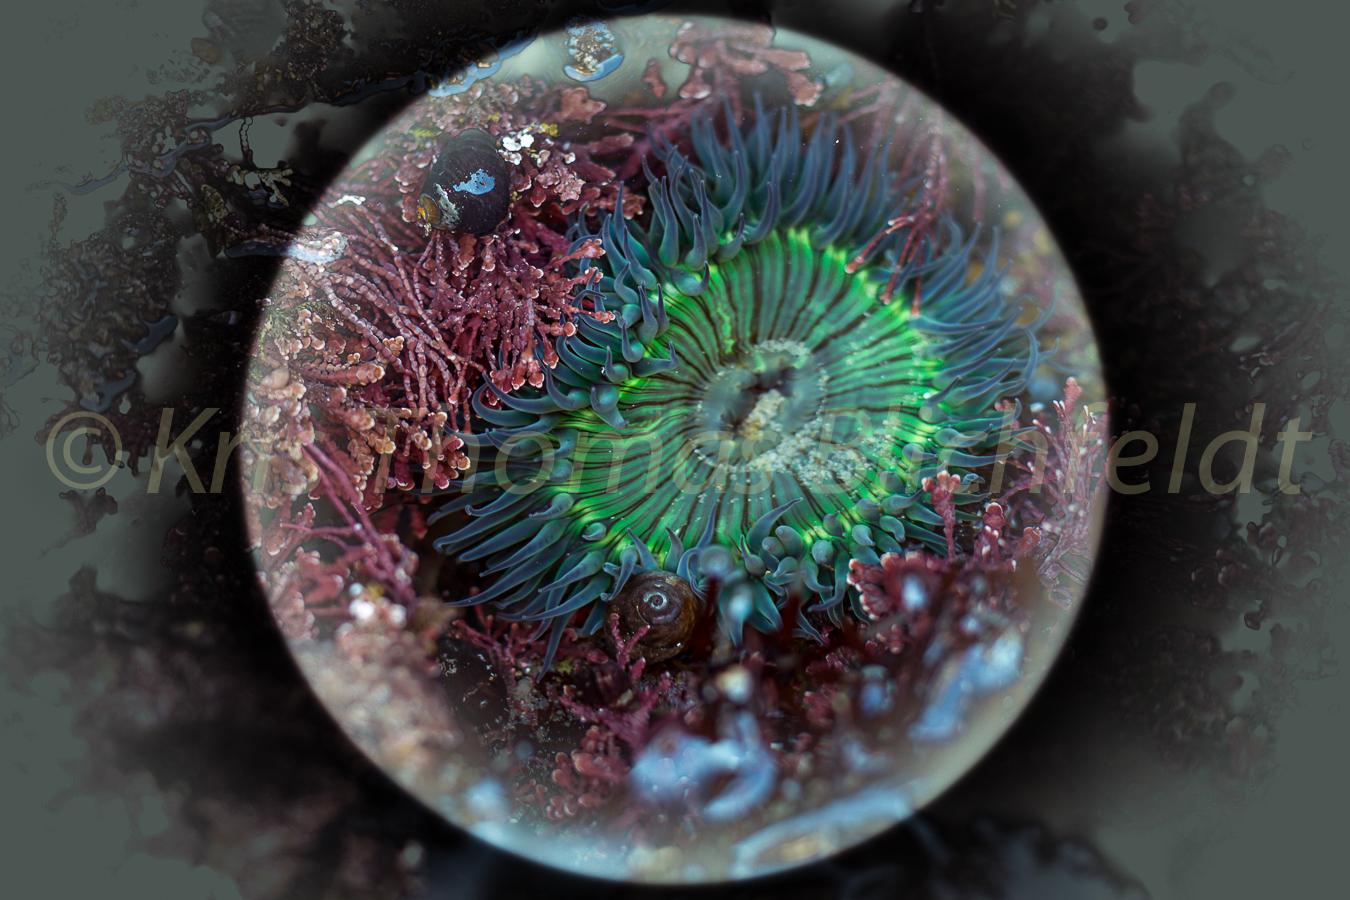 Anemone under glass